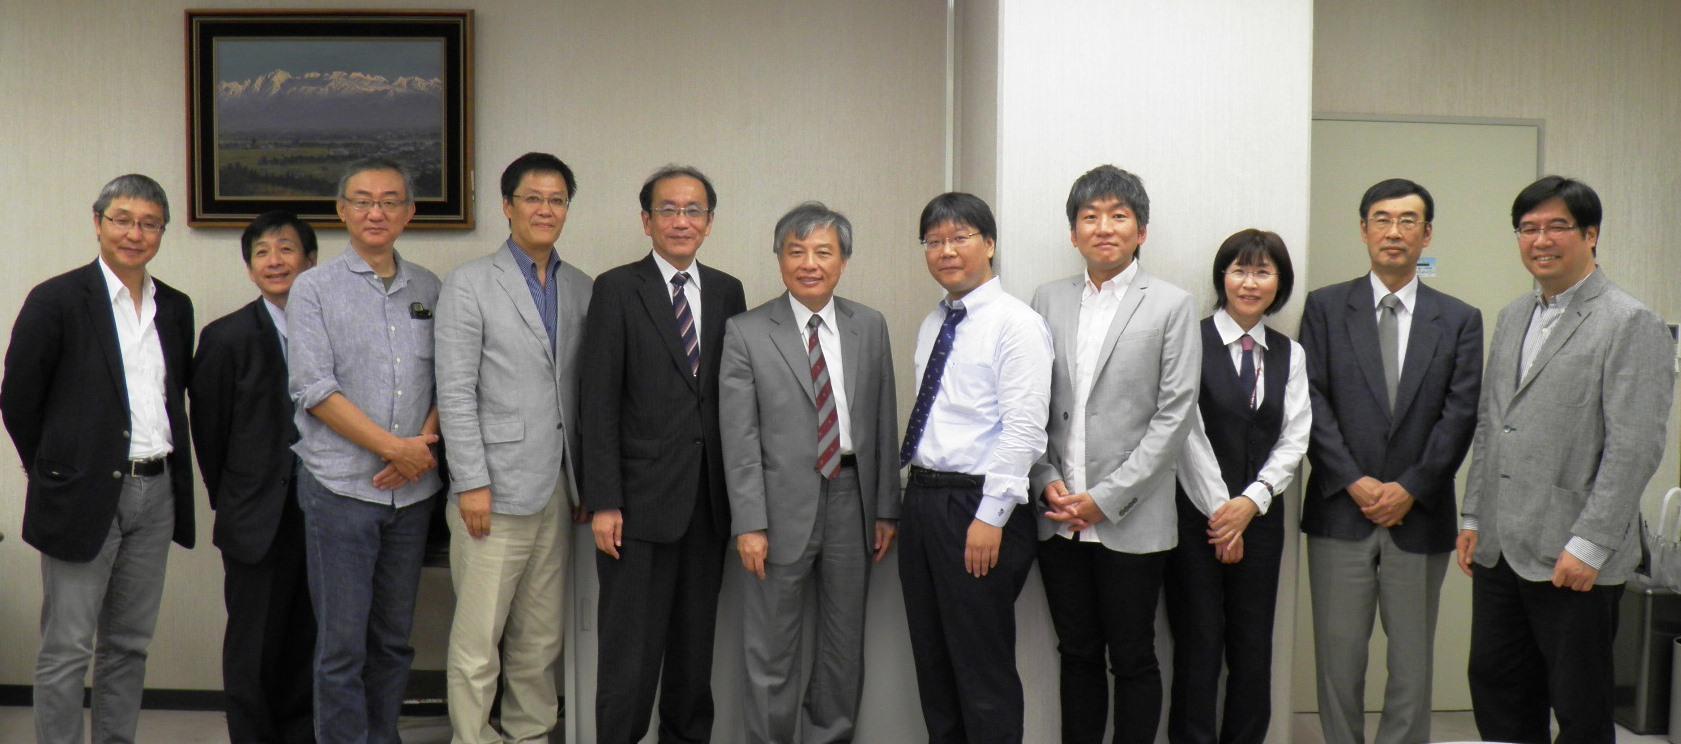 http://www.eco.u-toyama.ac.jp/news/images/20151001-2.jpg